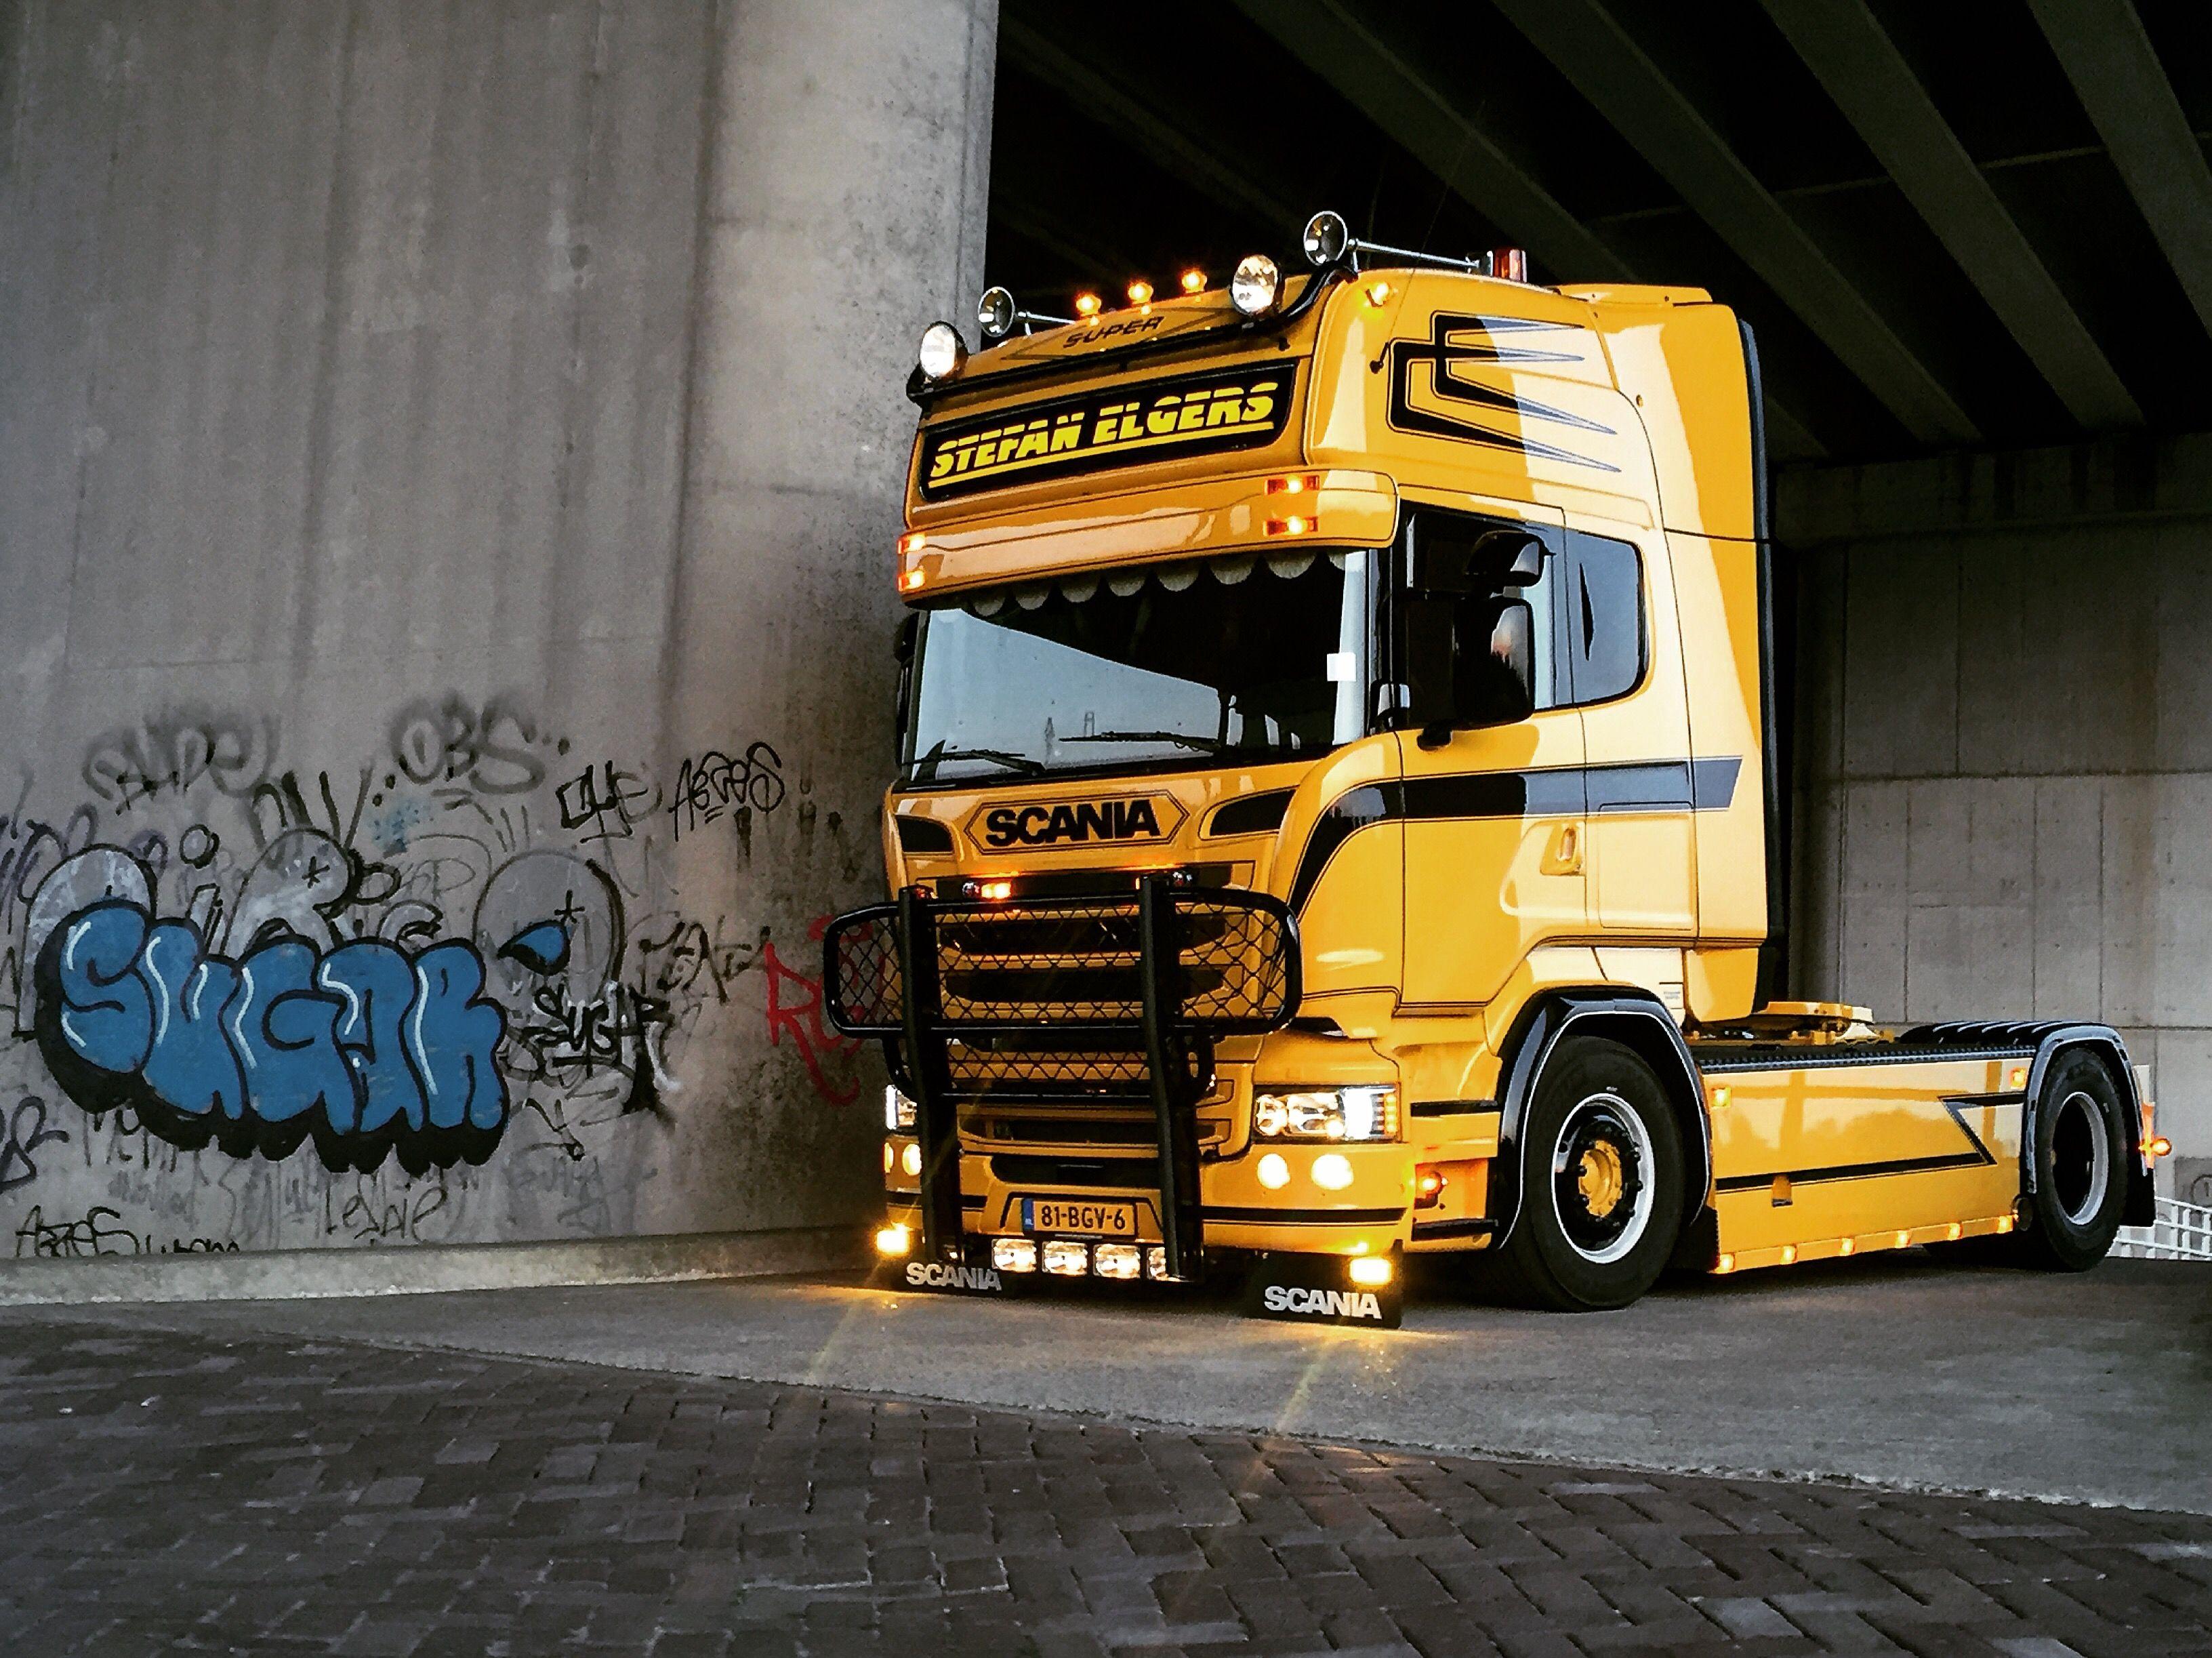 scania v8 r730 stefan elgers scania semi trucks train. Black Bedroom Furniture Sets. Home Design Ideas